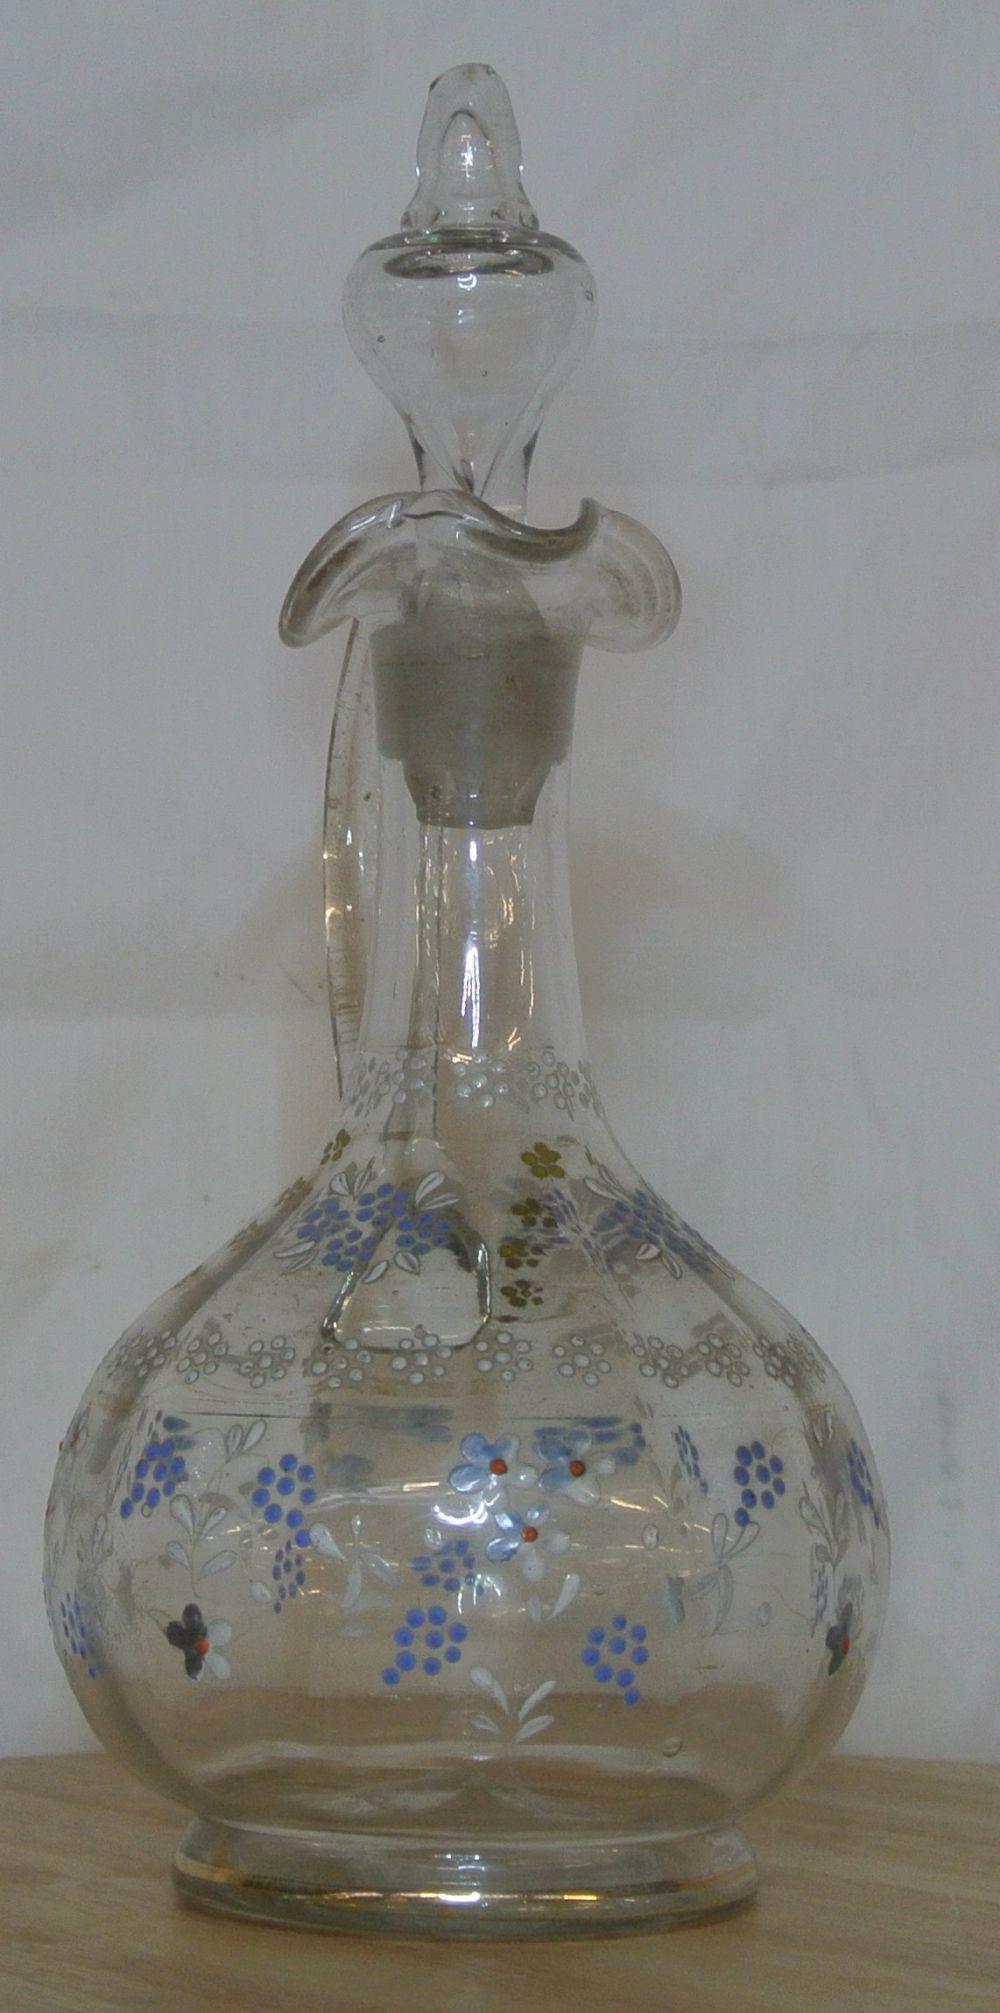 Lot 99: An antique hand painted glass claret jug